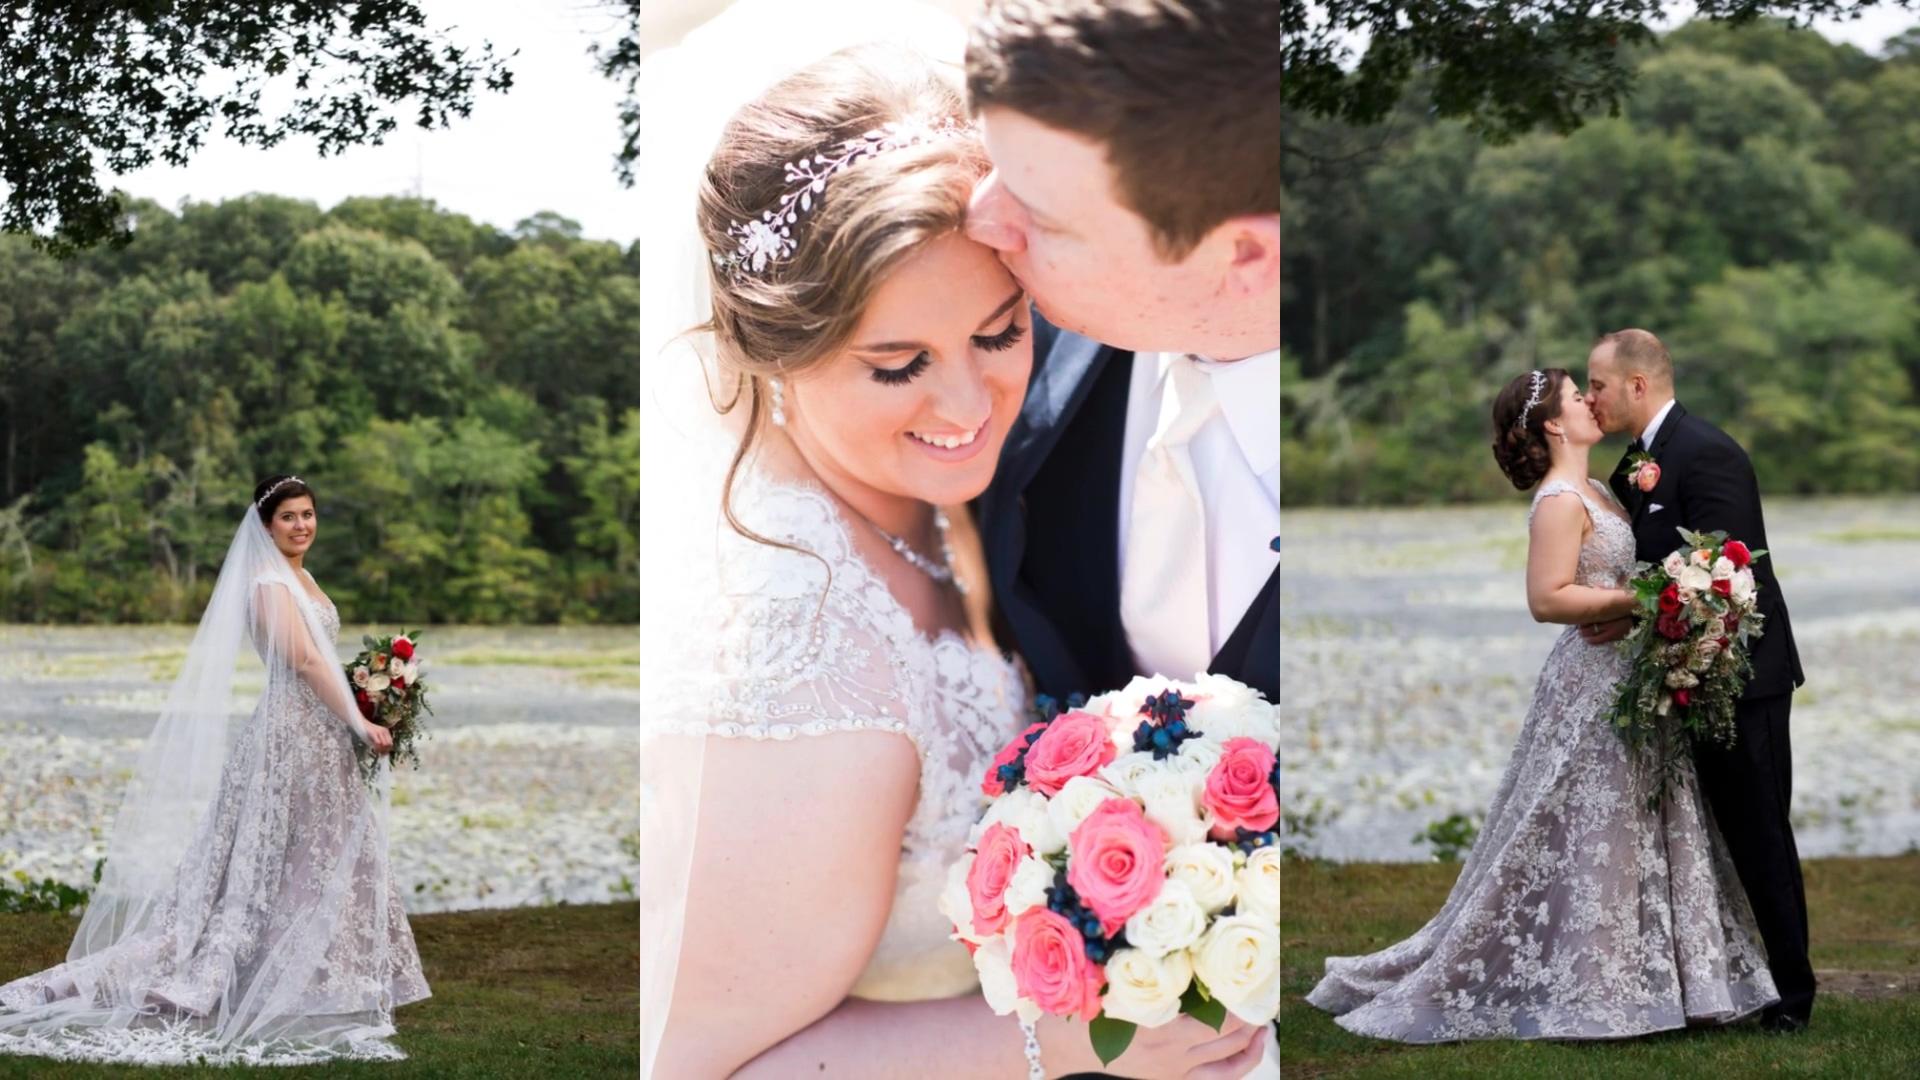 2020_Wedding_Photos_at_Peconic_Herb_Farm_1080p